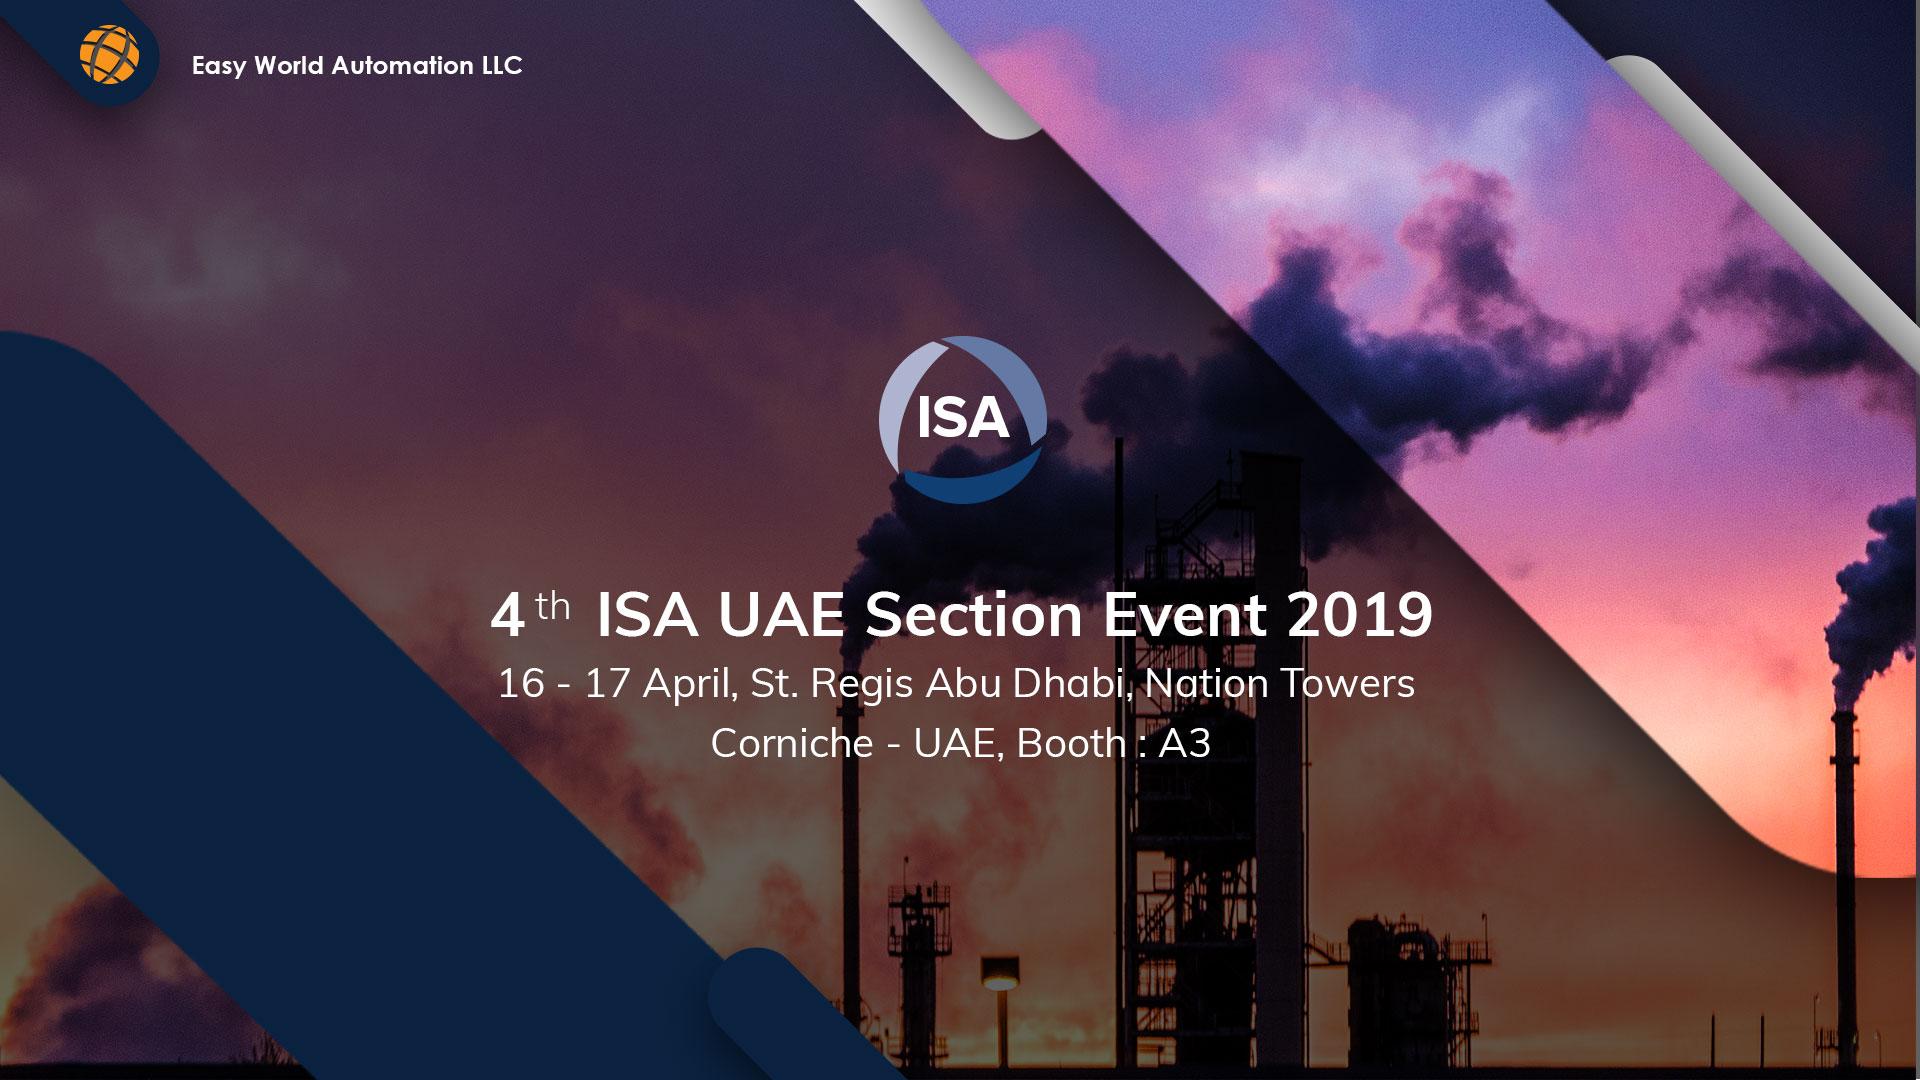 ISA UAE 2019 Exhibition